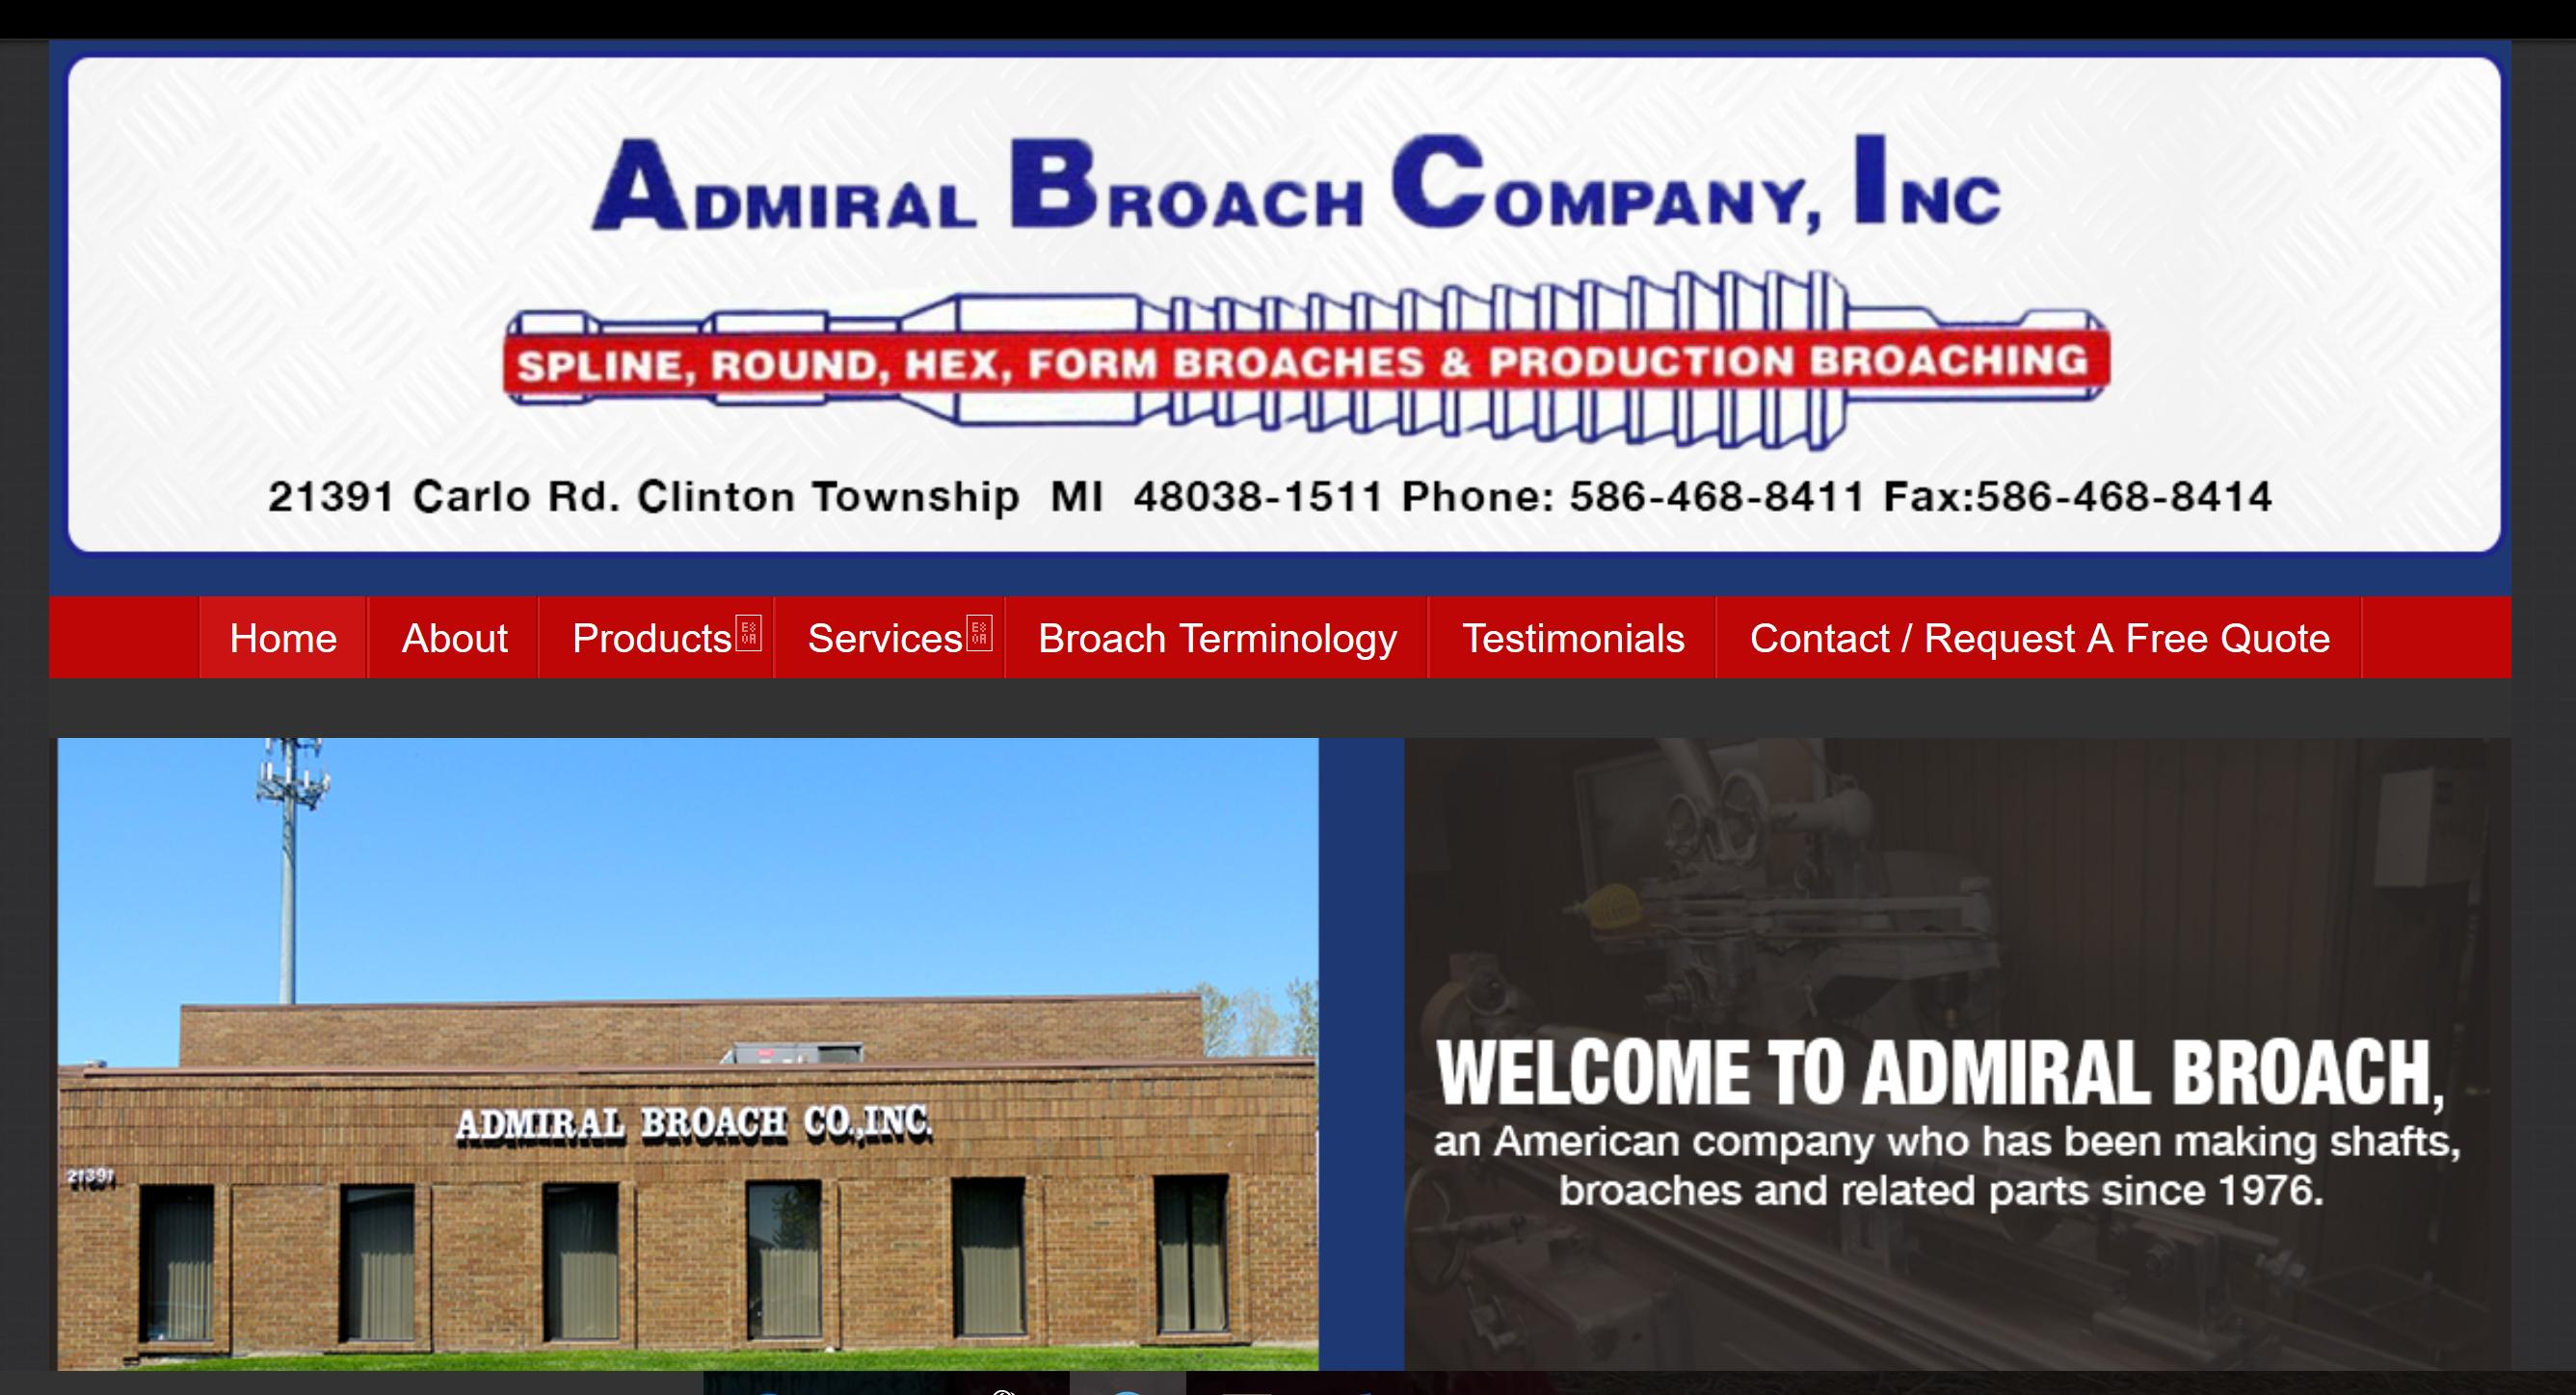 Admiral Broach Company, Inc.